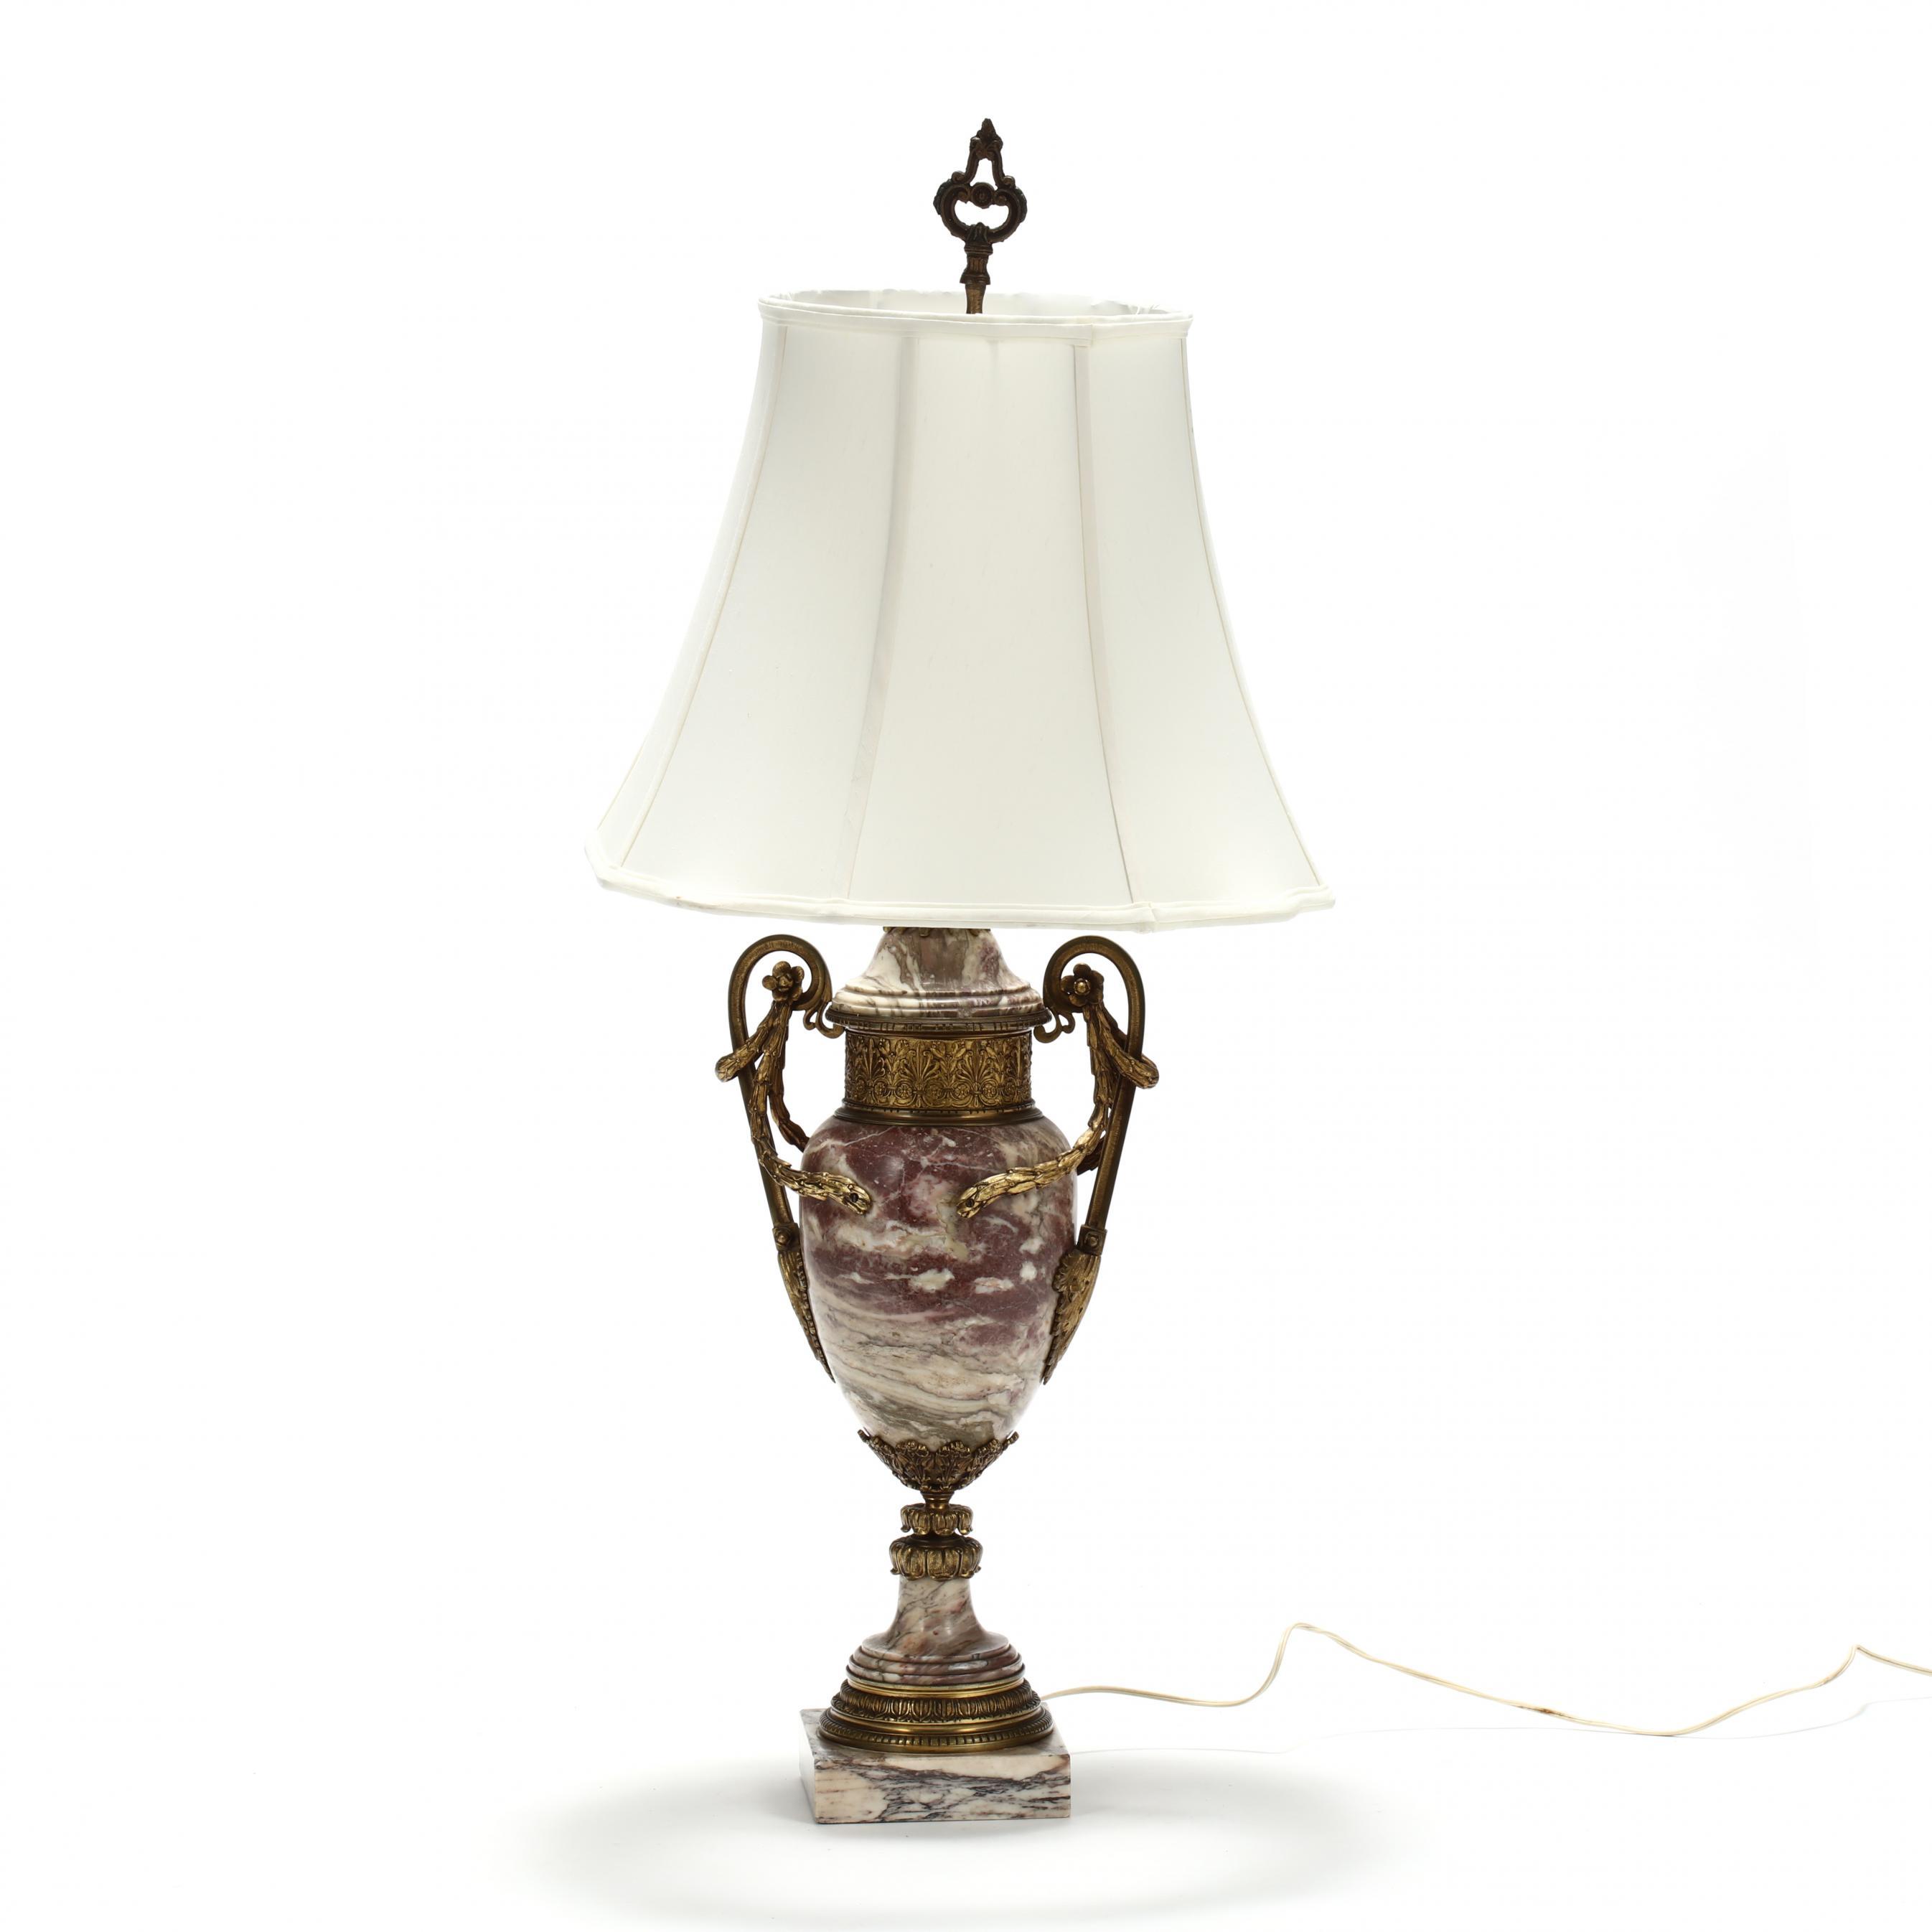 large-antique-ormolu-mounted-table-lamp